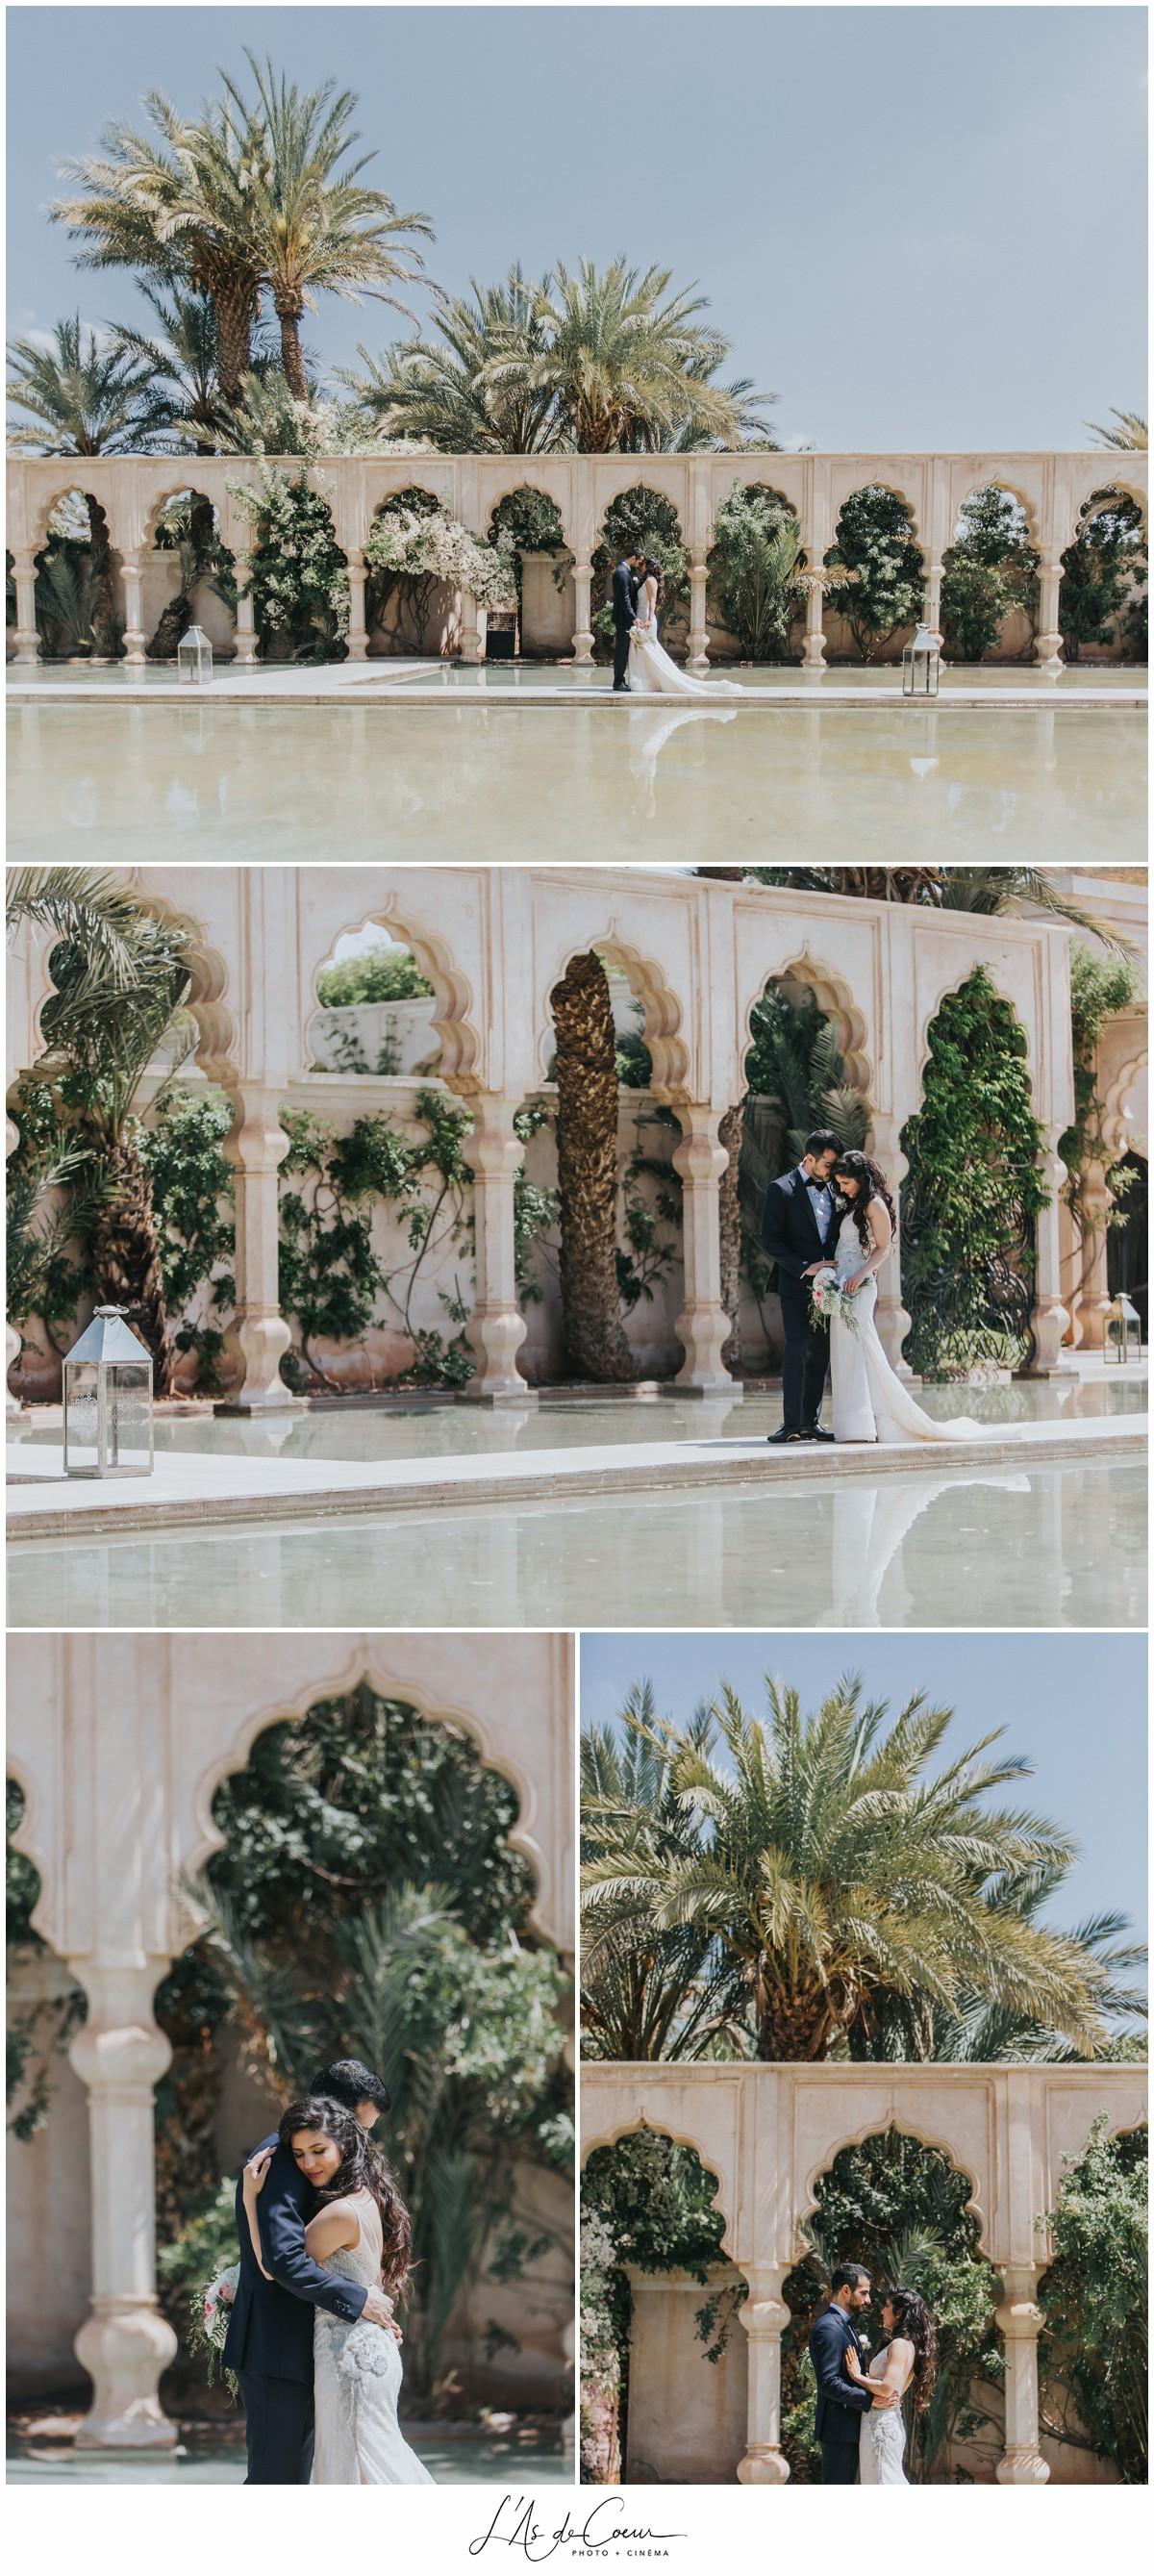 Photographe mariage Palais Namaskar Maroc Marrakech